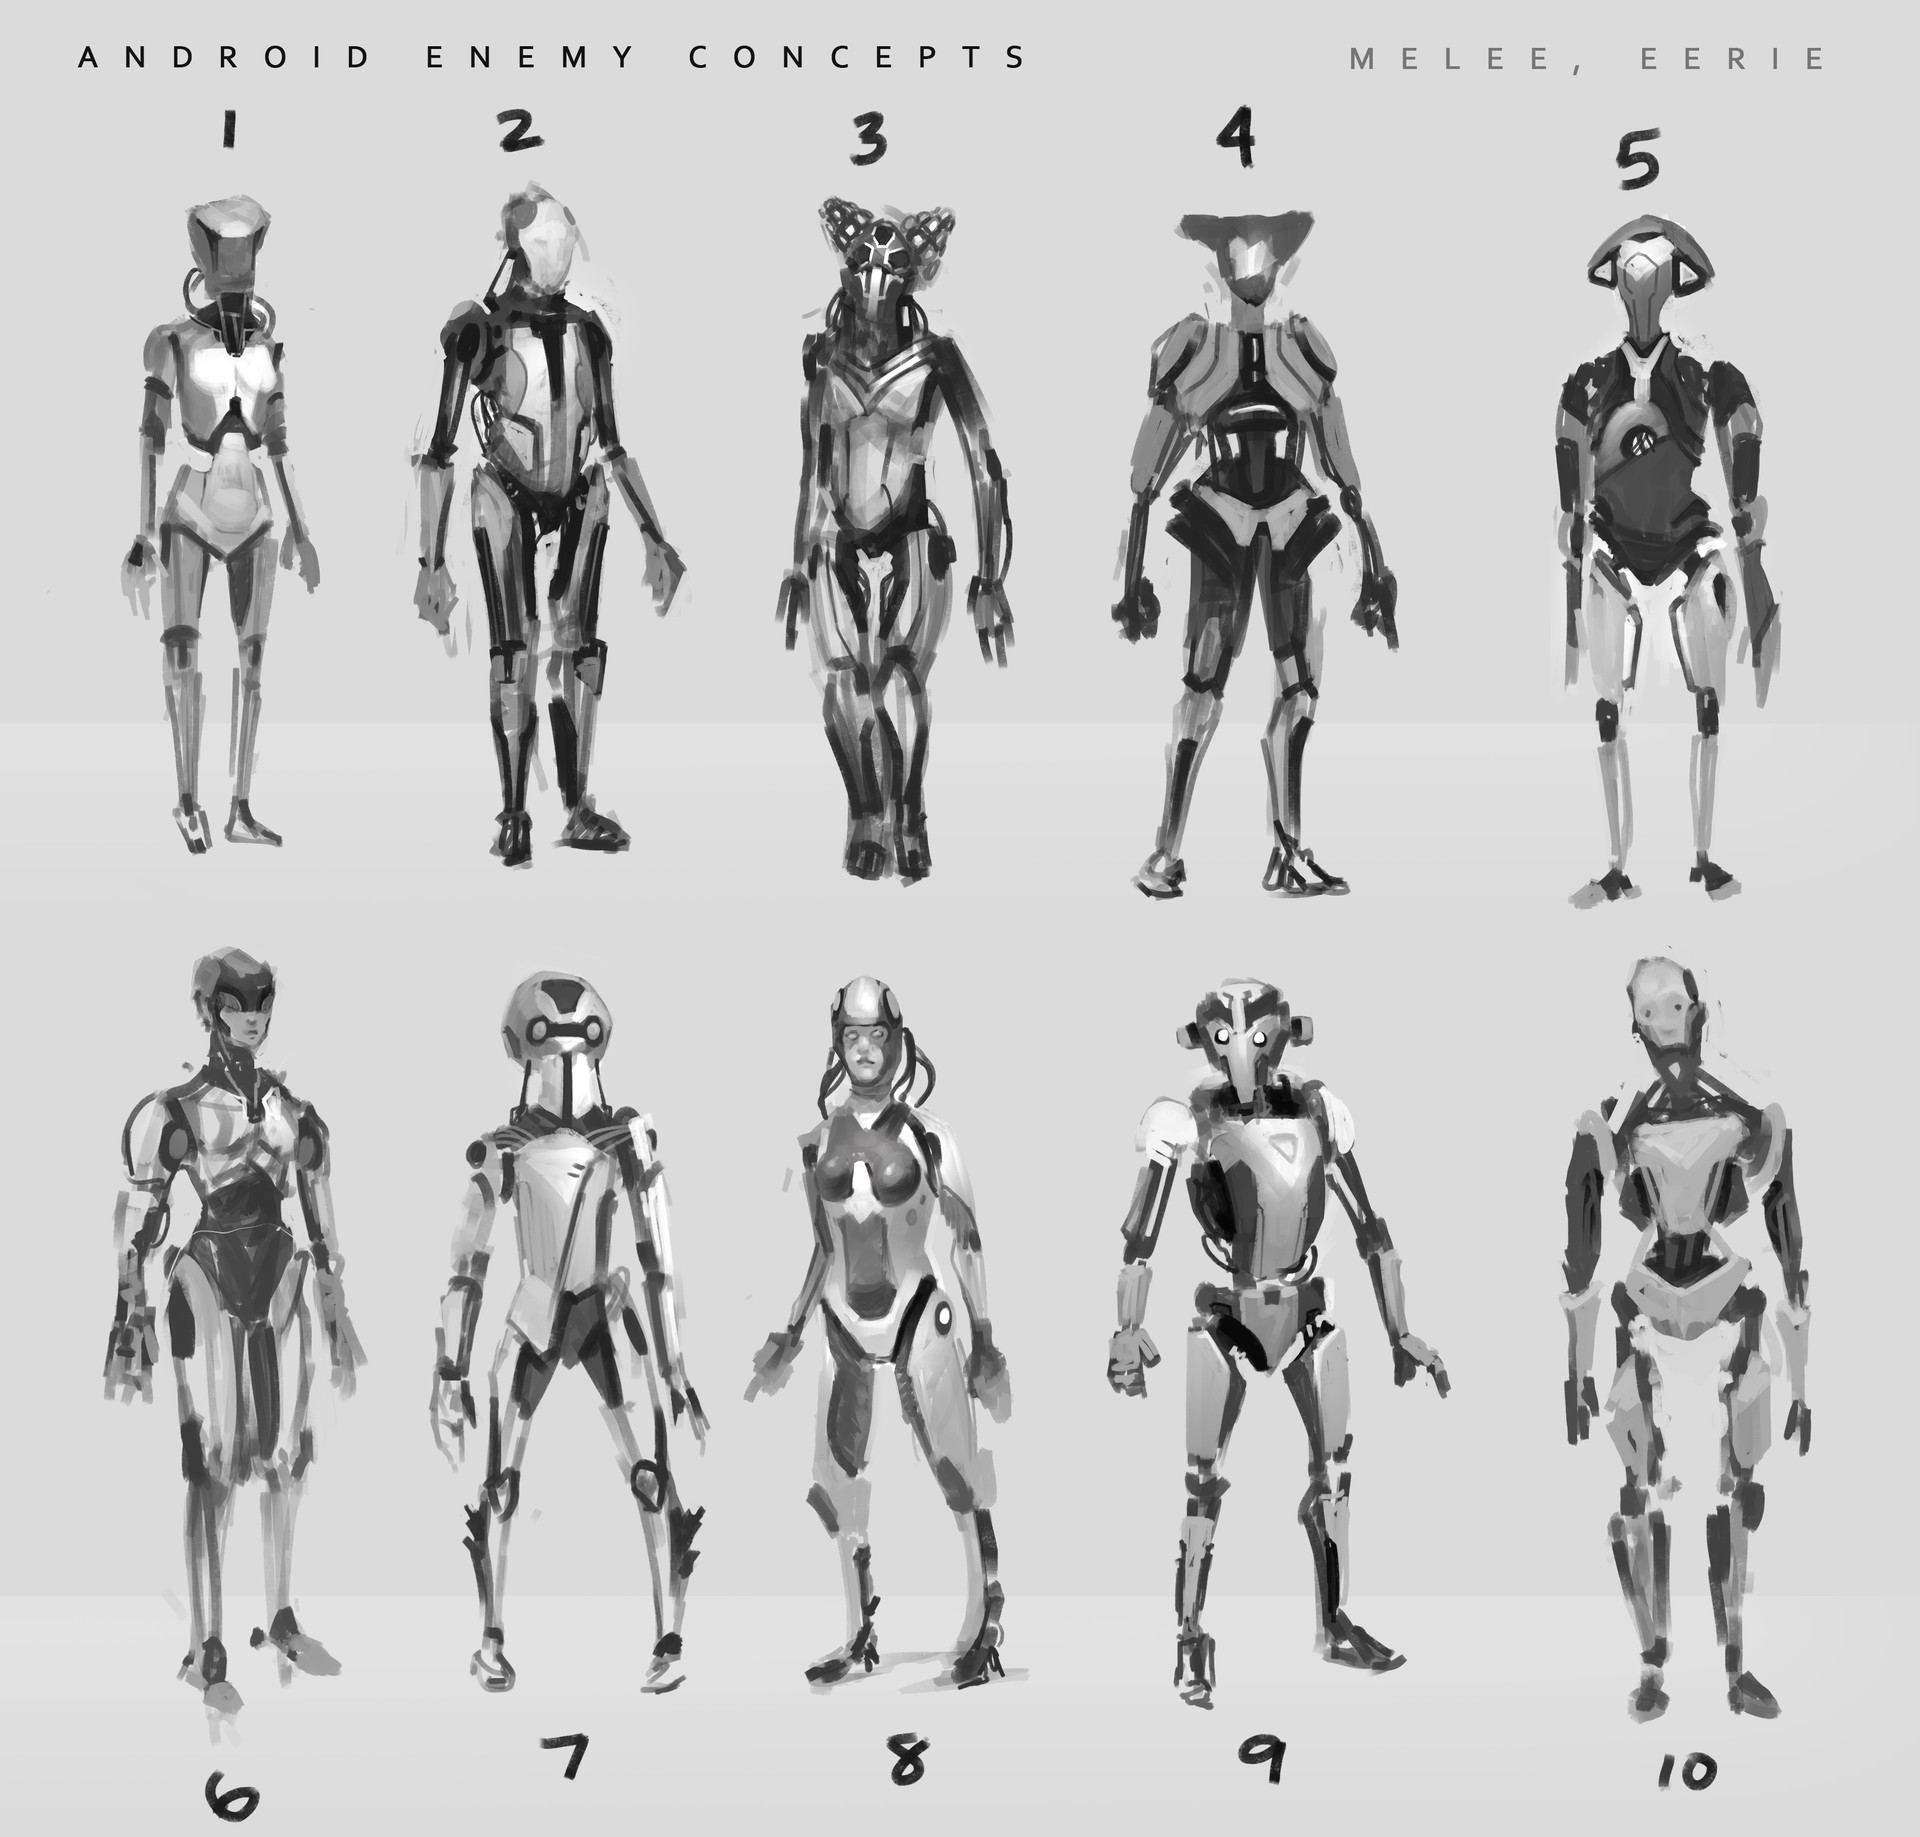 Gabriel ramos robotconcepts01